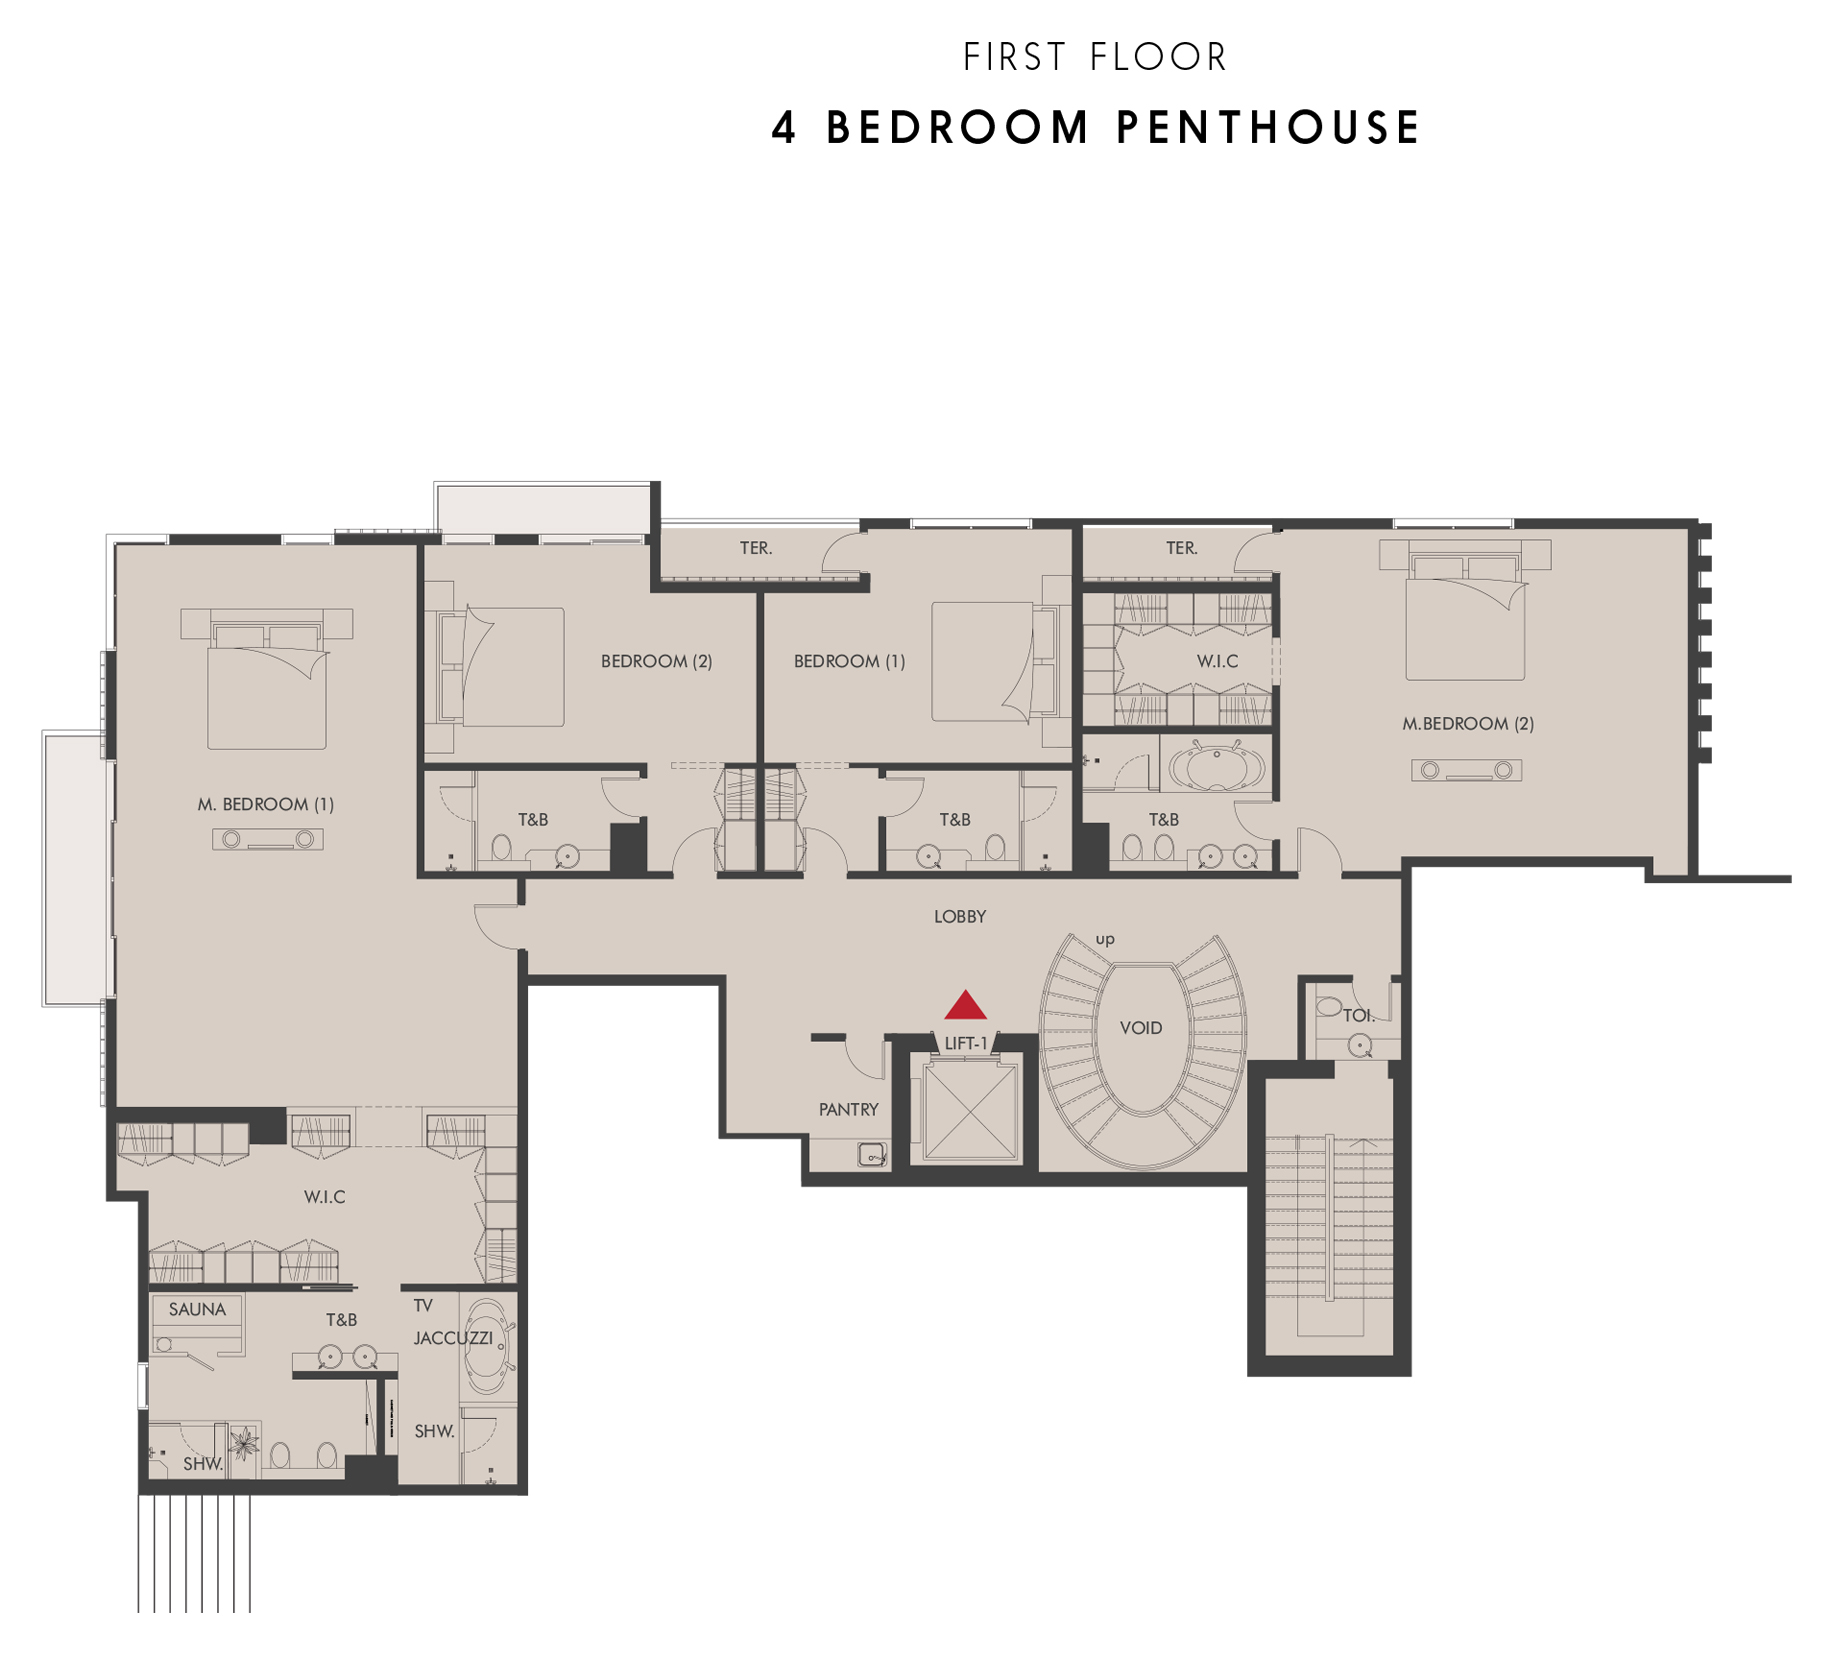 Penthouse - First Floor